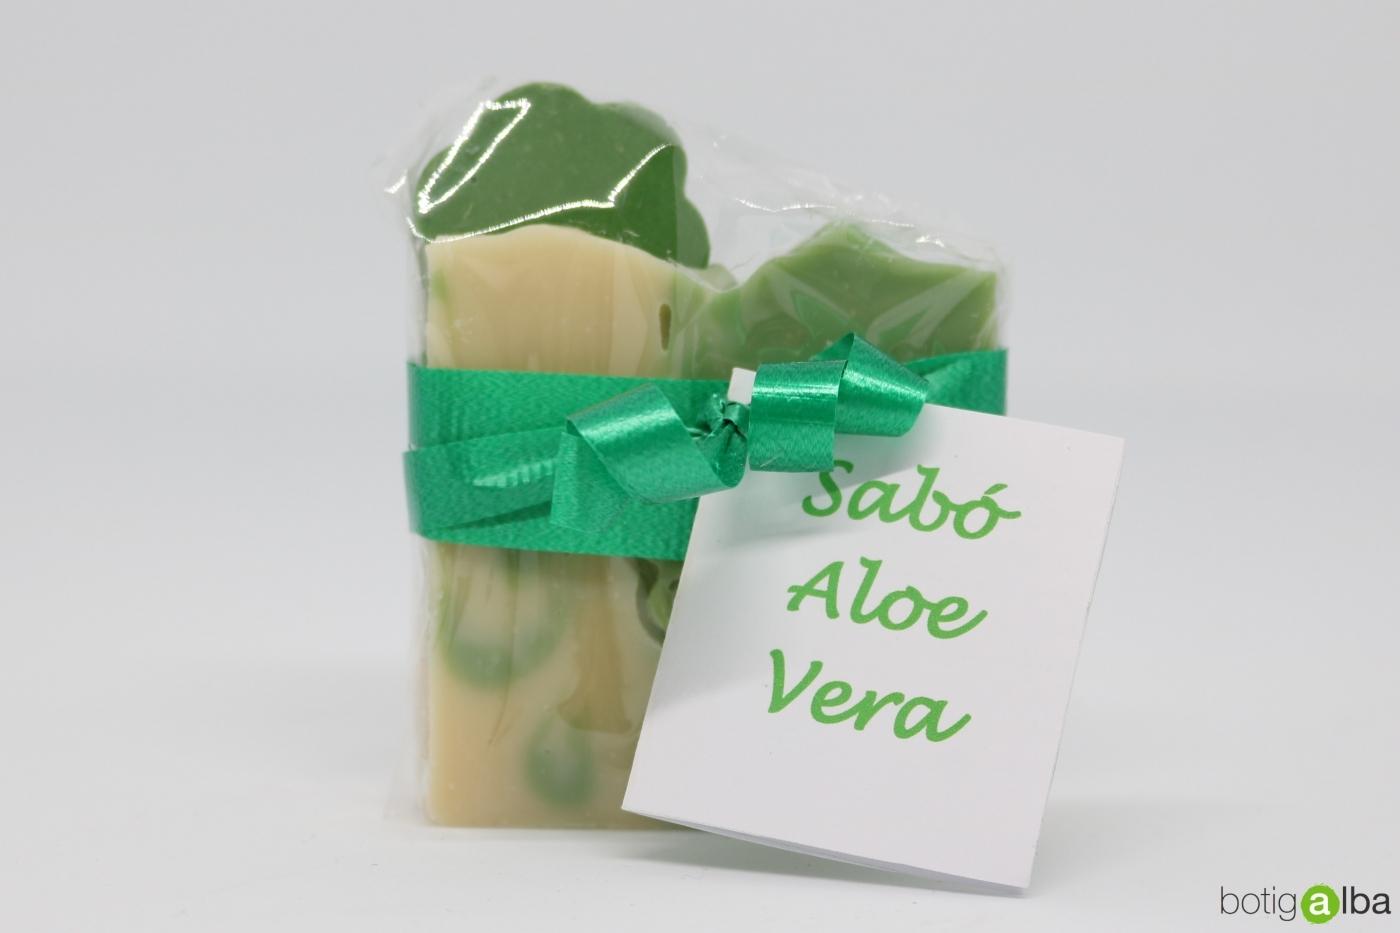 SABÓ ALOE VERA